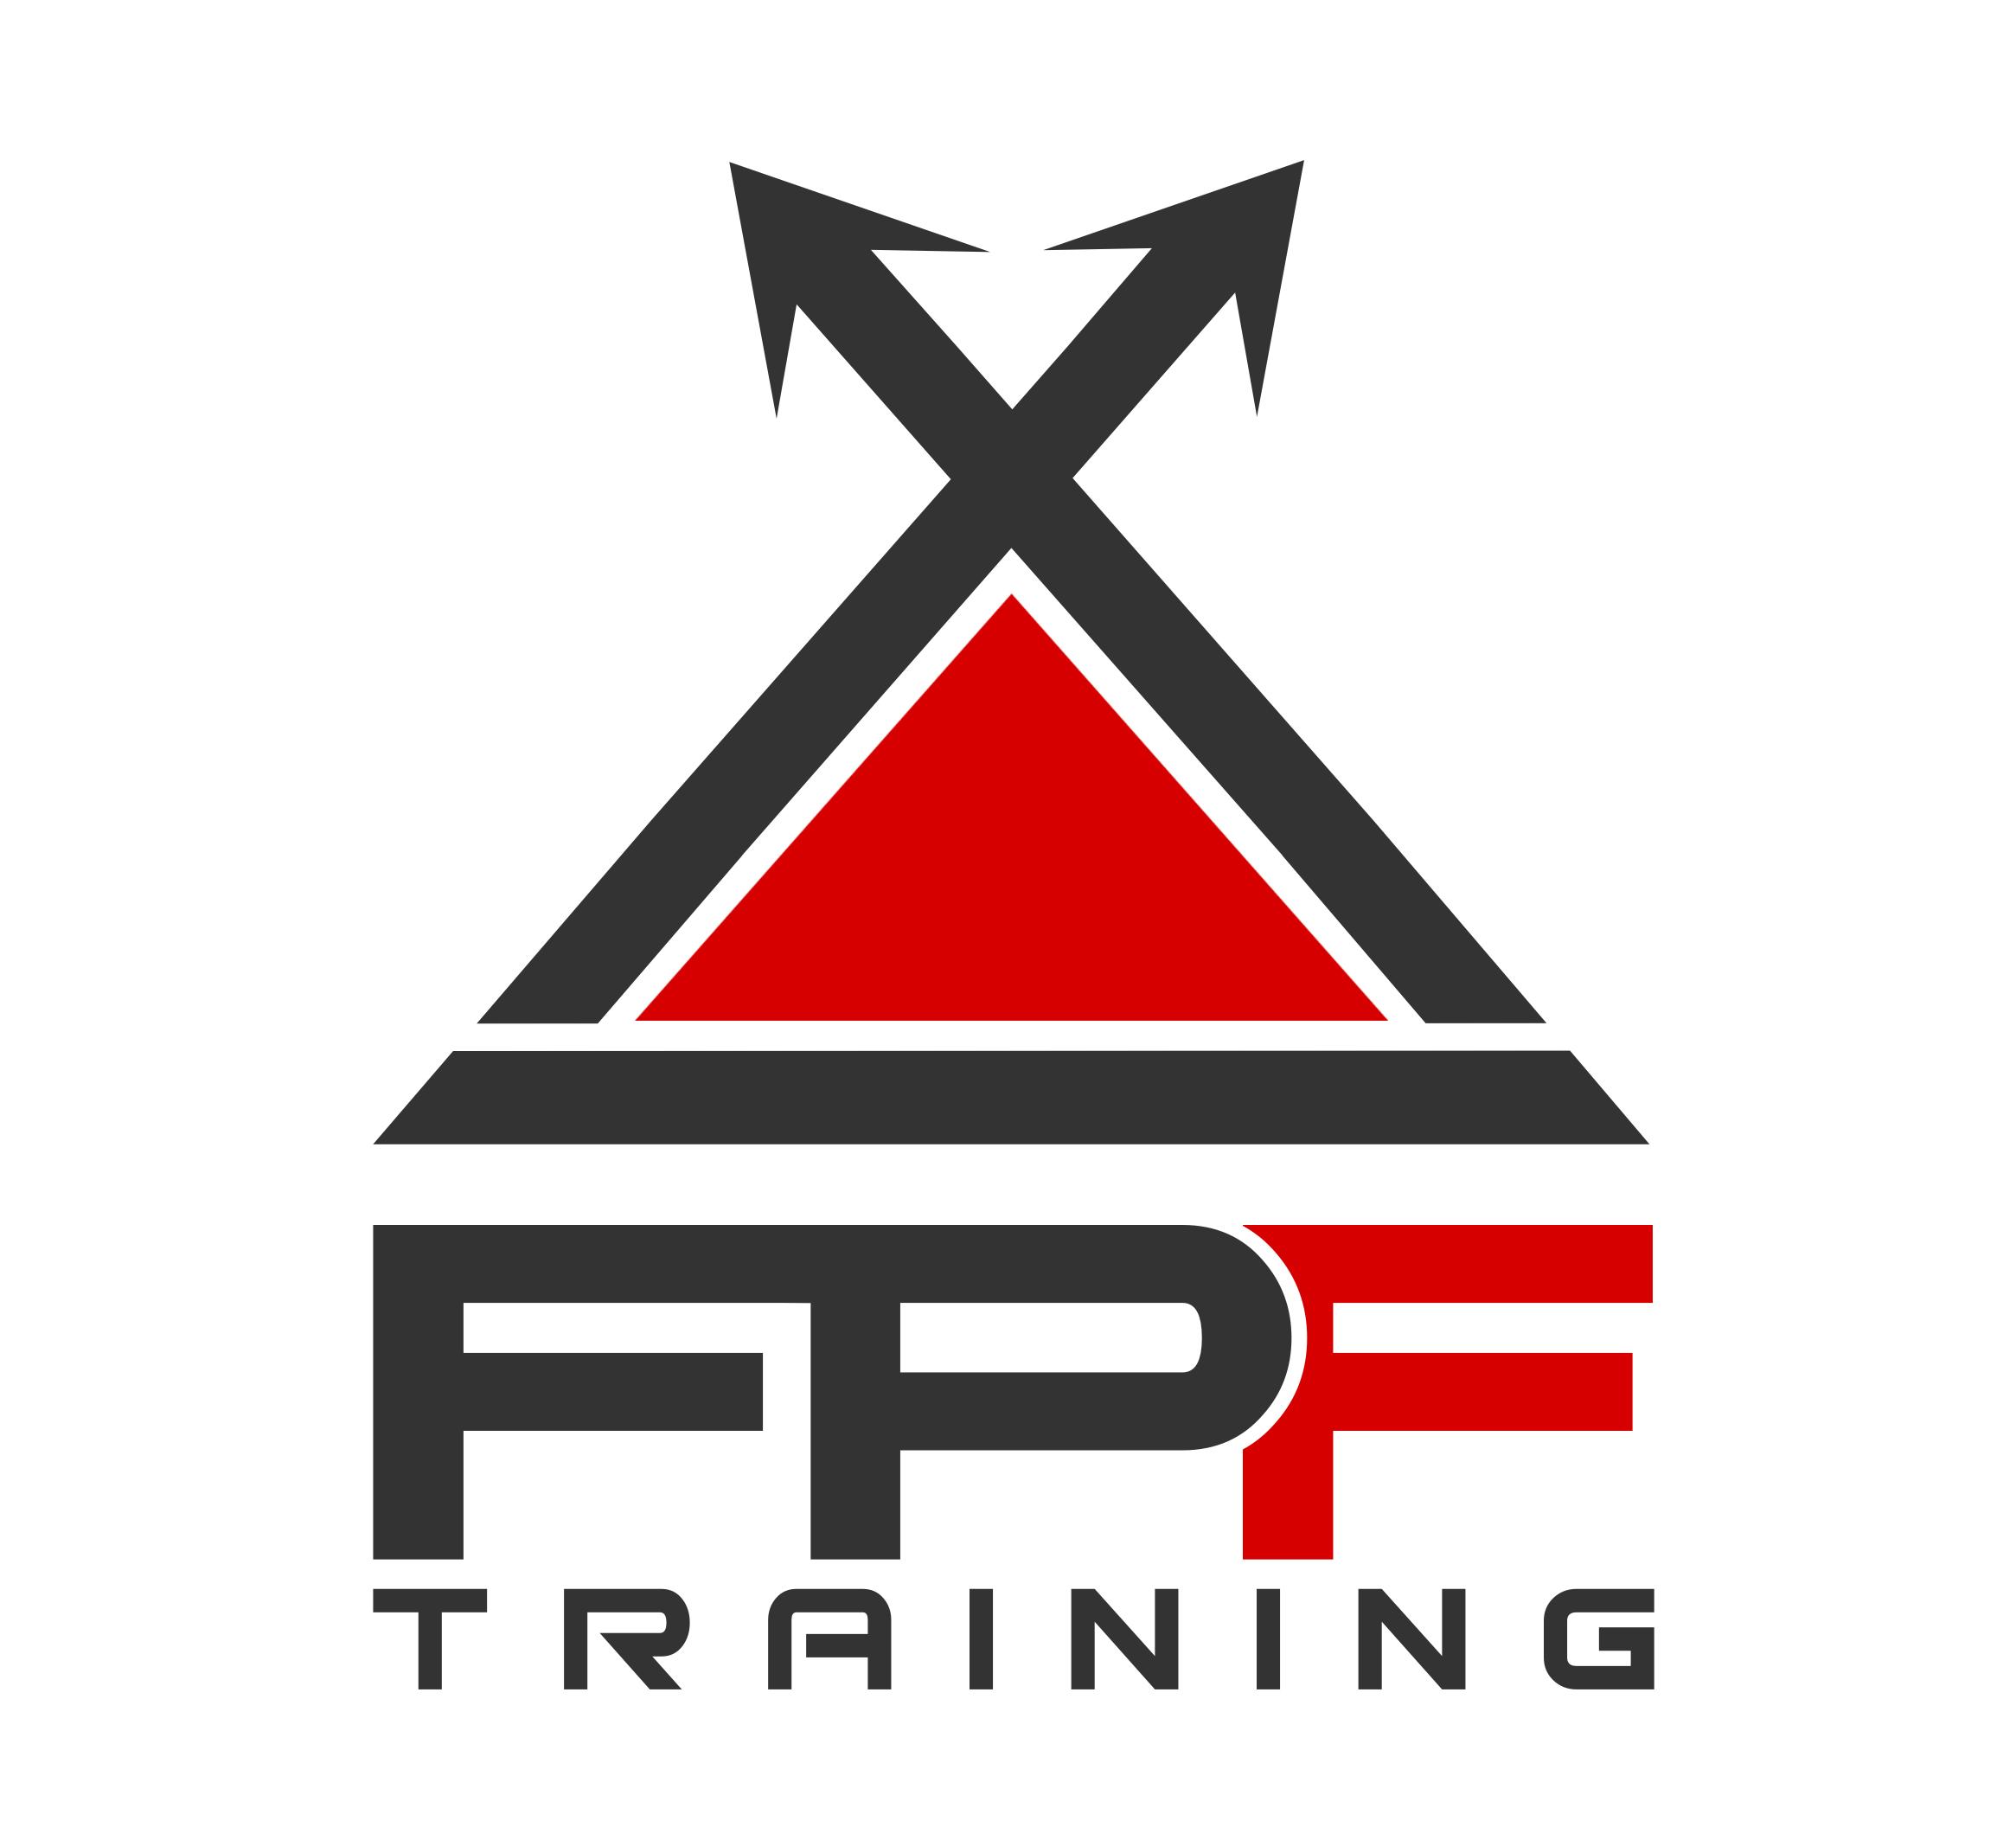 fpf_logo_final